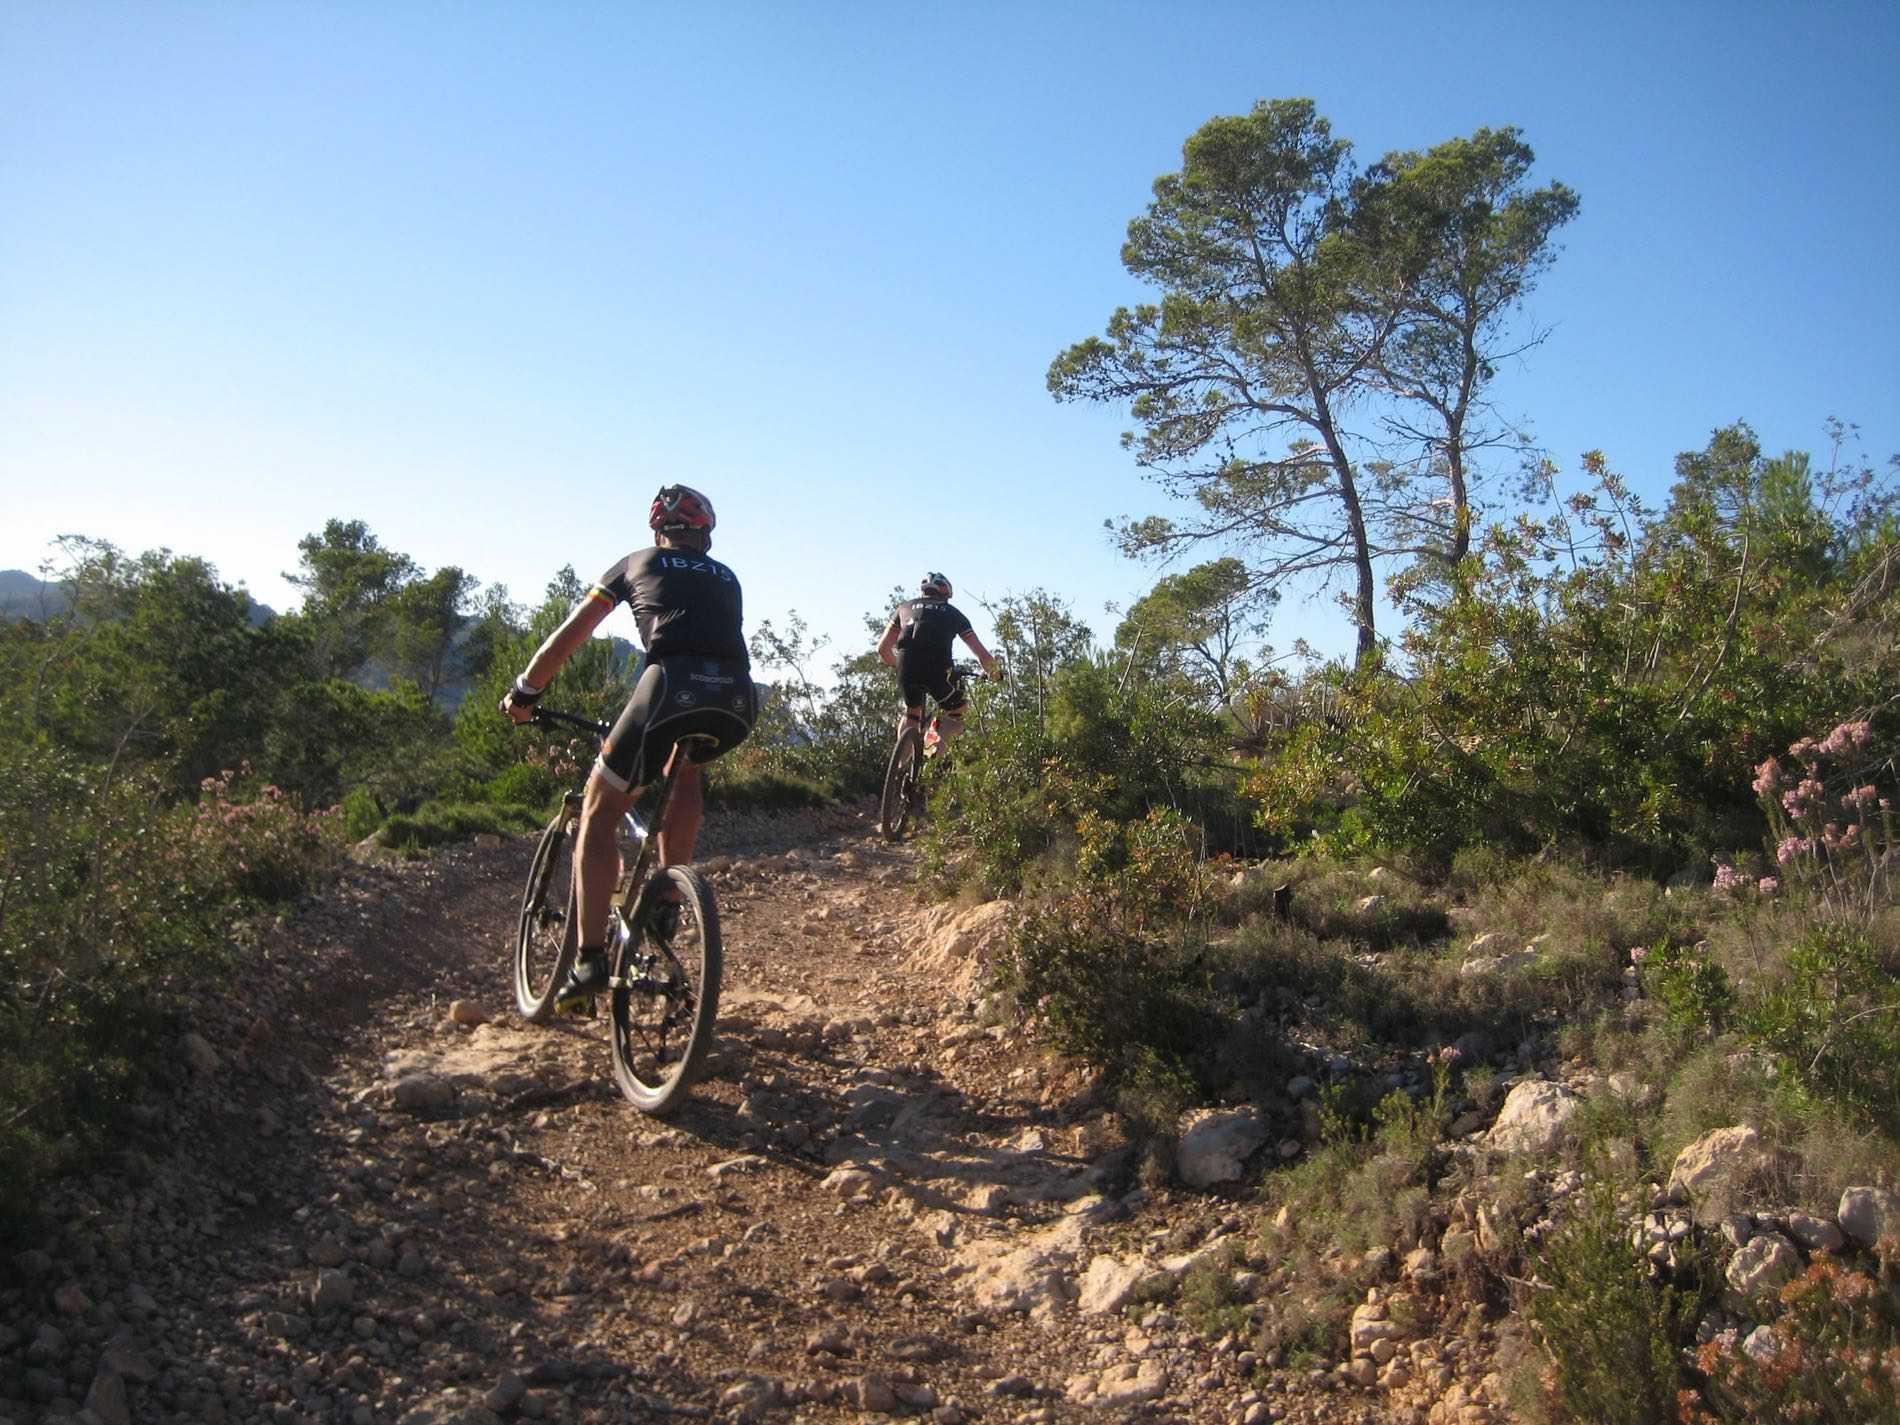 Arrowed cycling roads on Ibiza